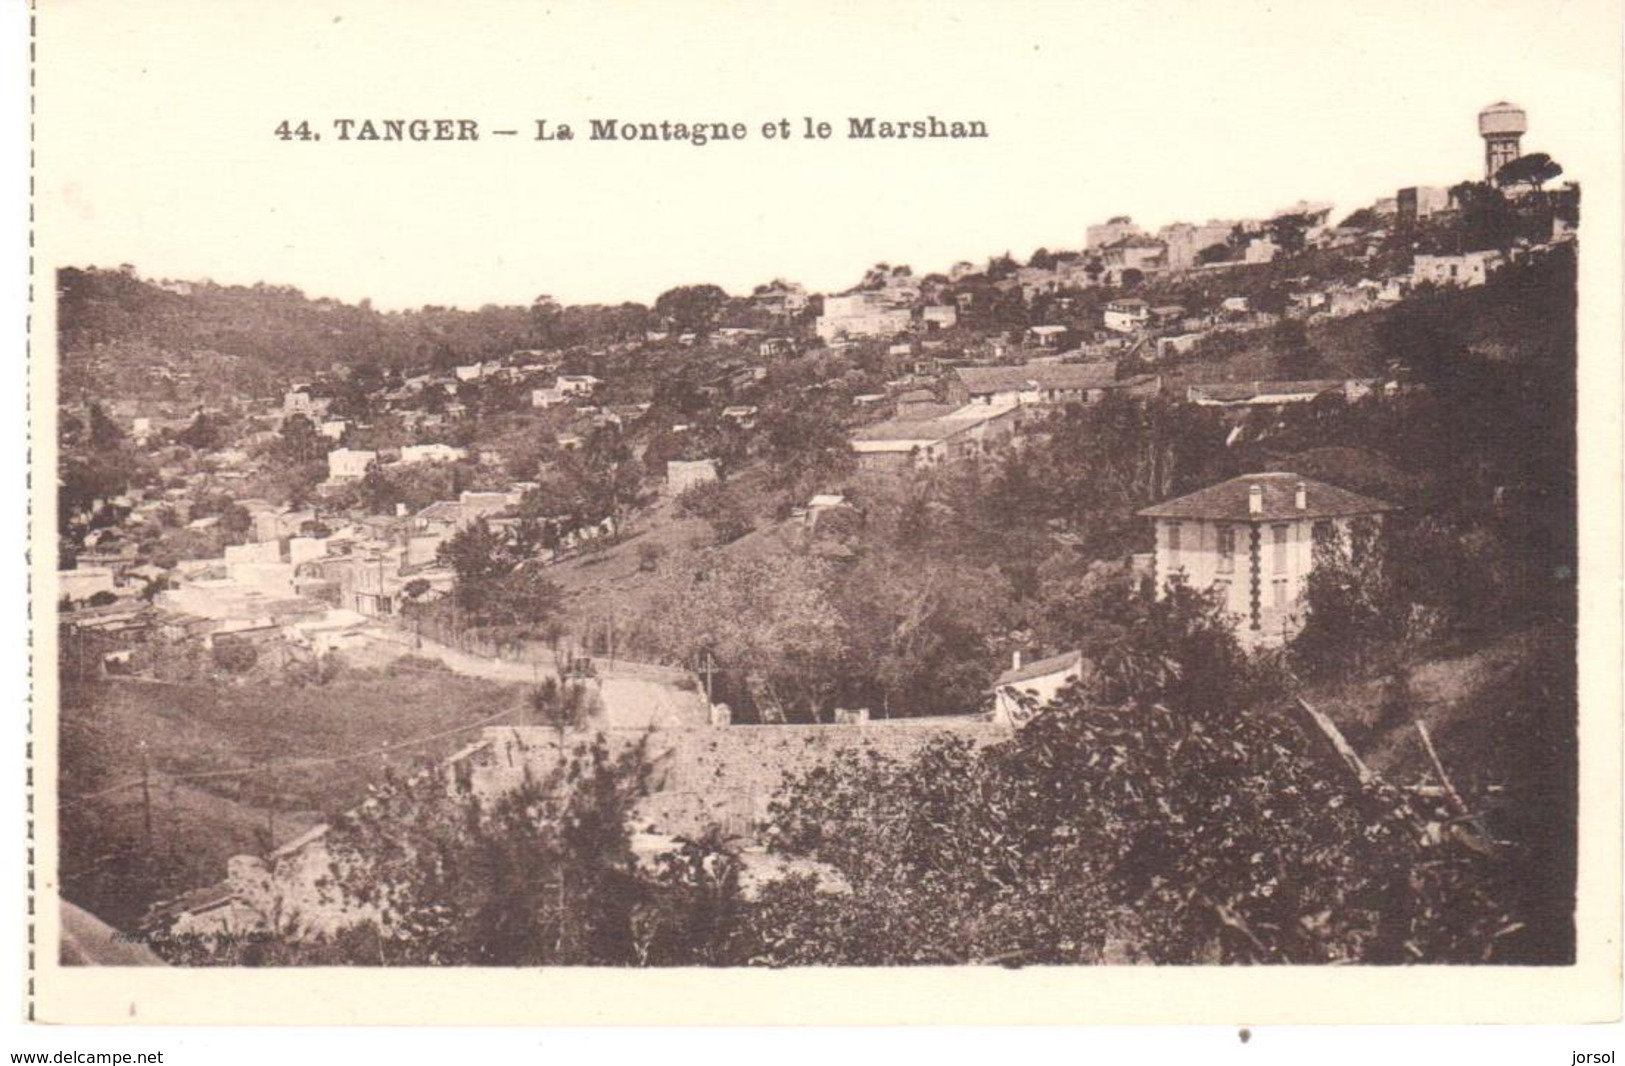 POSTAL   TANGER  -MARRUECOS  - LE MONTAGNE ET LE MARSHAN  (LA MONTAÑA Y MARSHAN) - Tanger